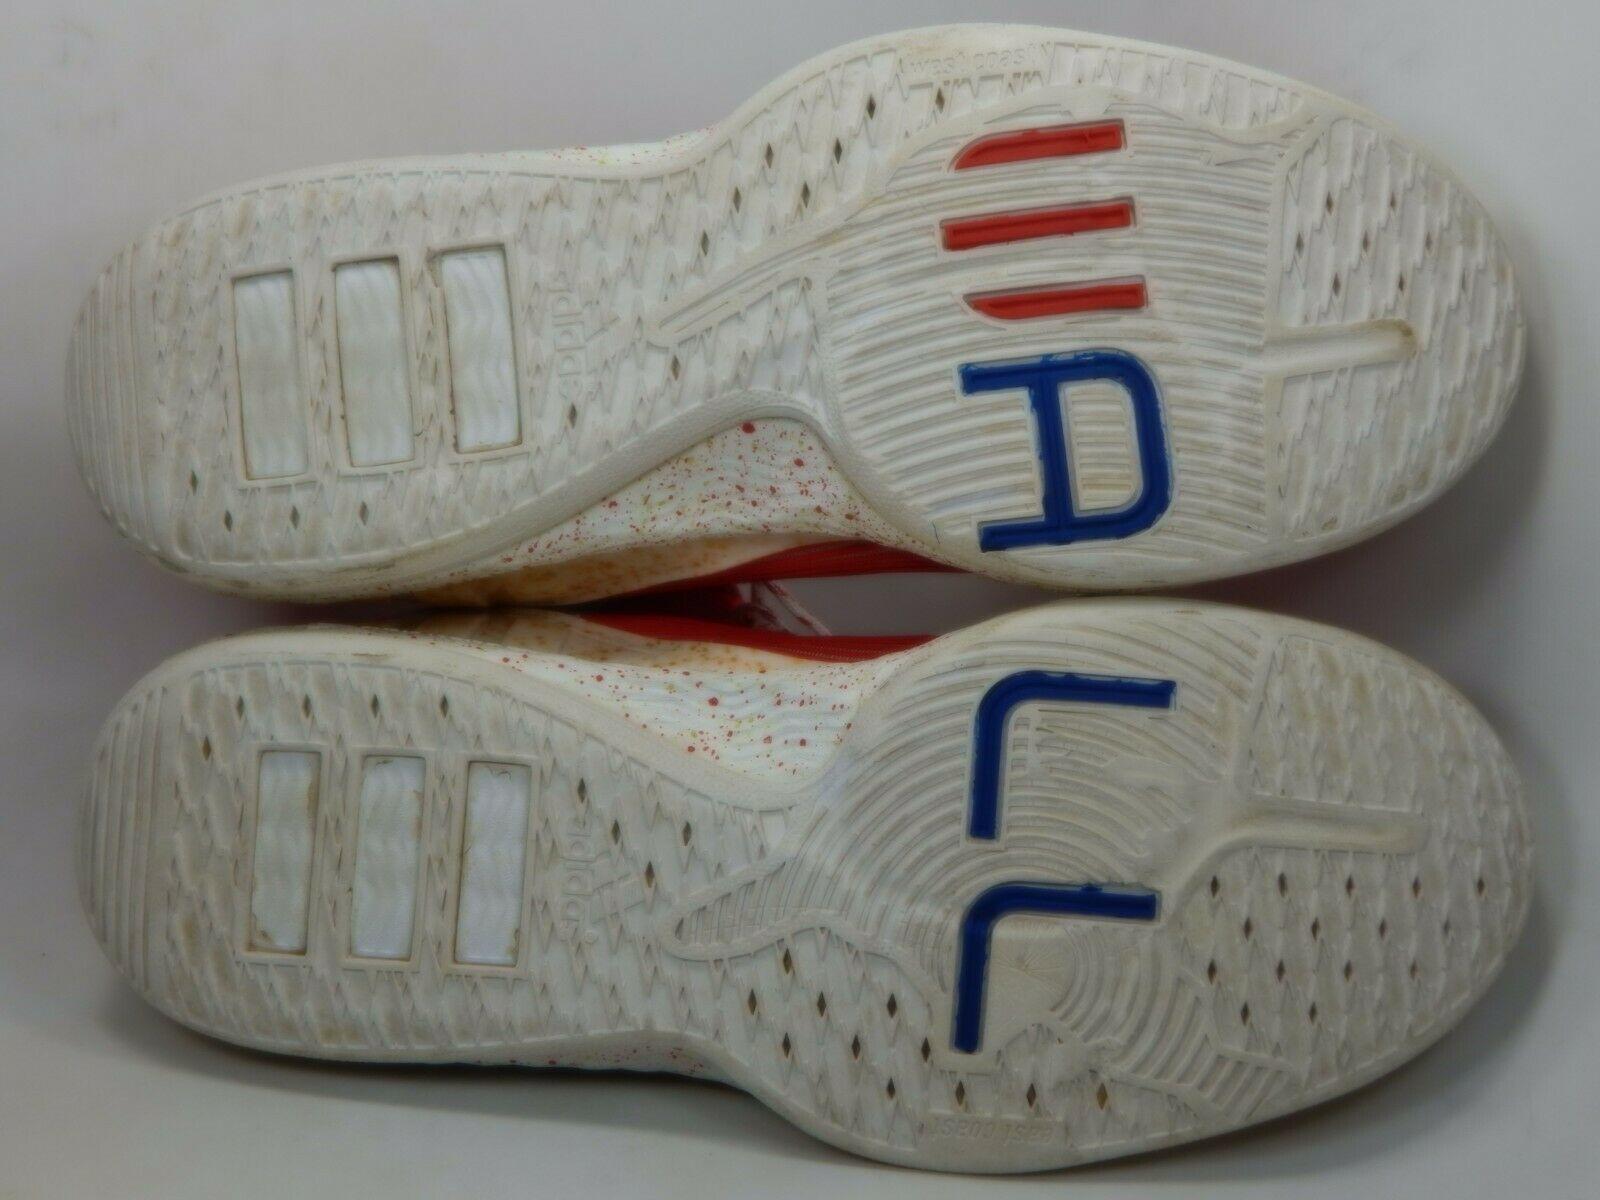 Adidas John J Wall Size 13 M (D) EU 48 Men's Basketball Shoes Scarlet Red S84015